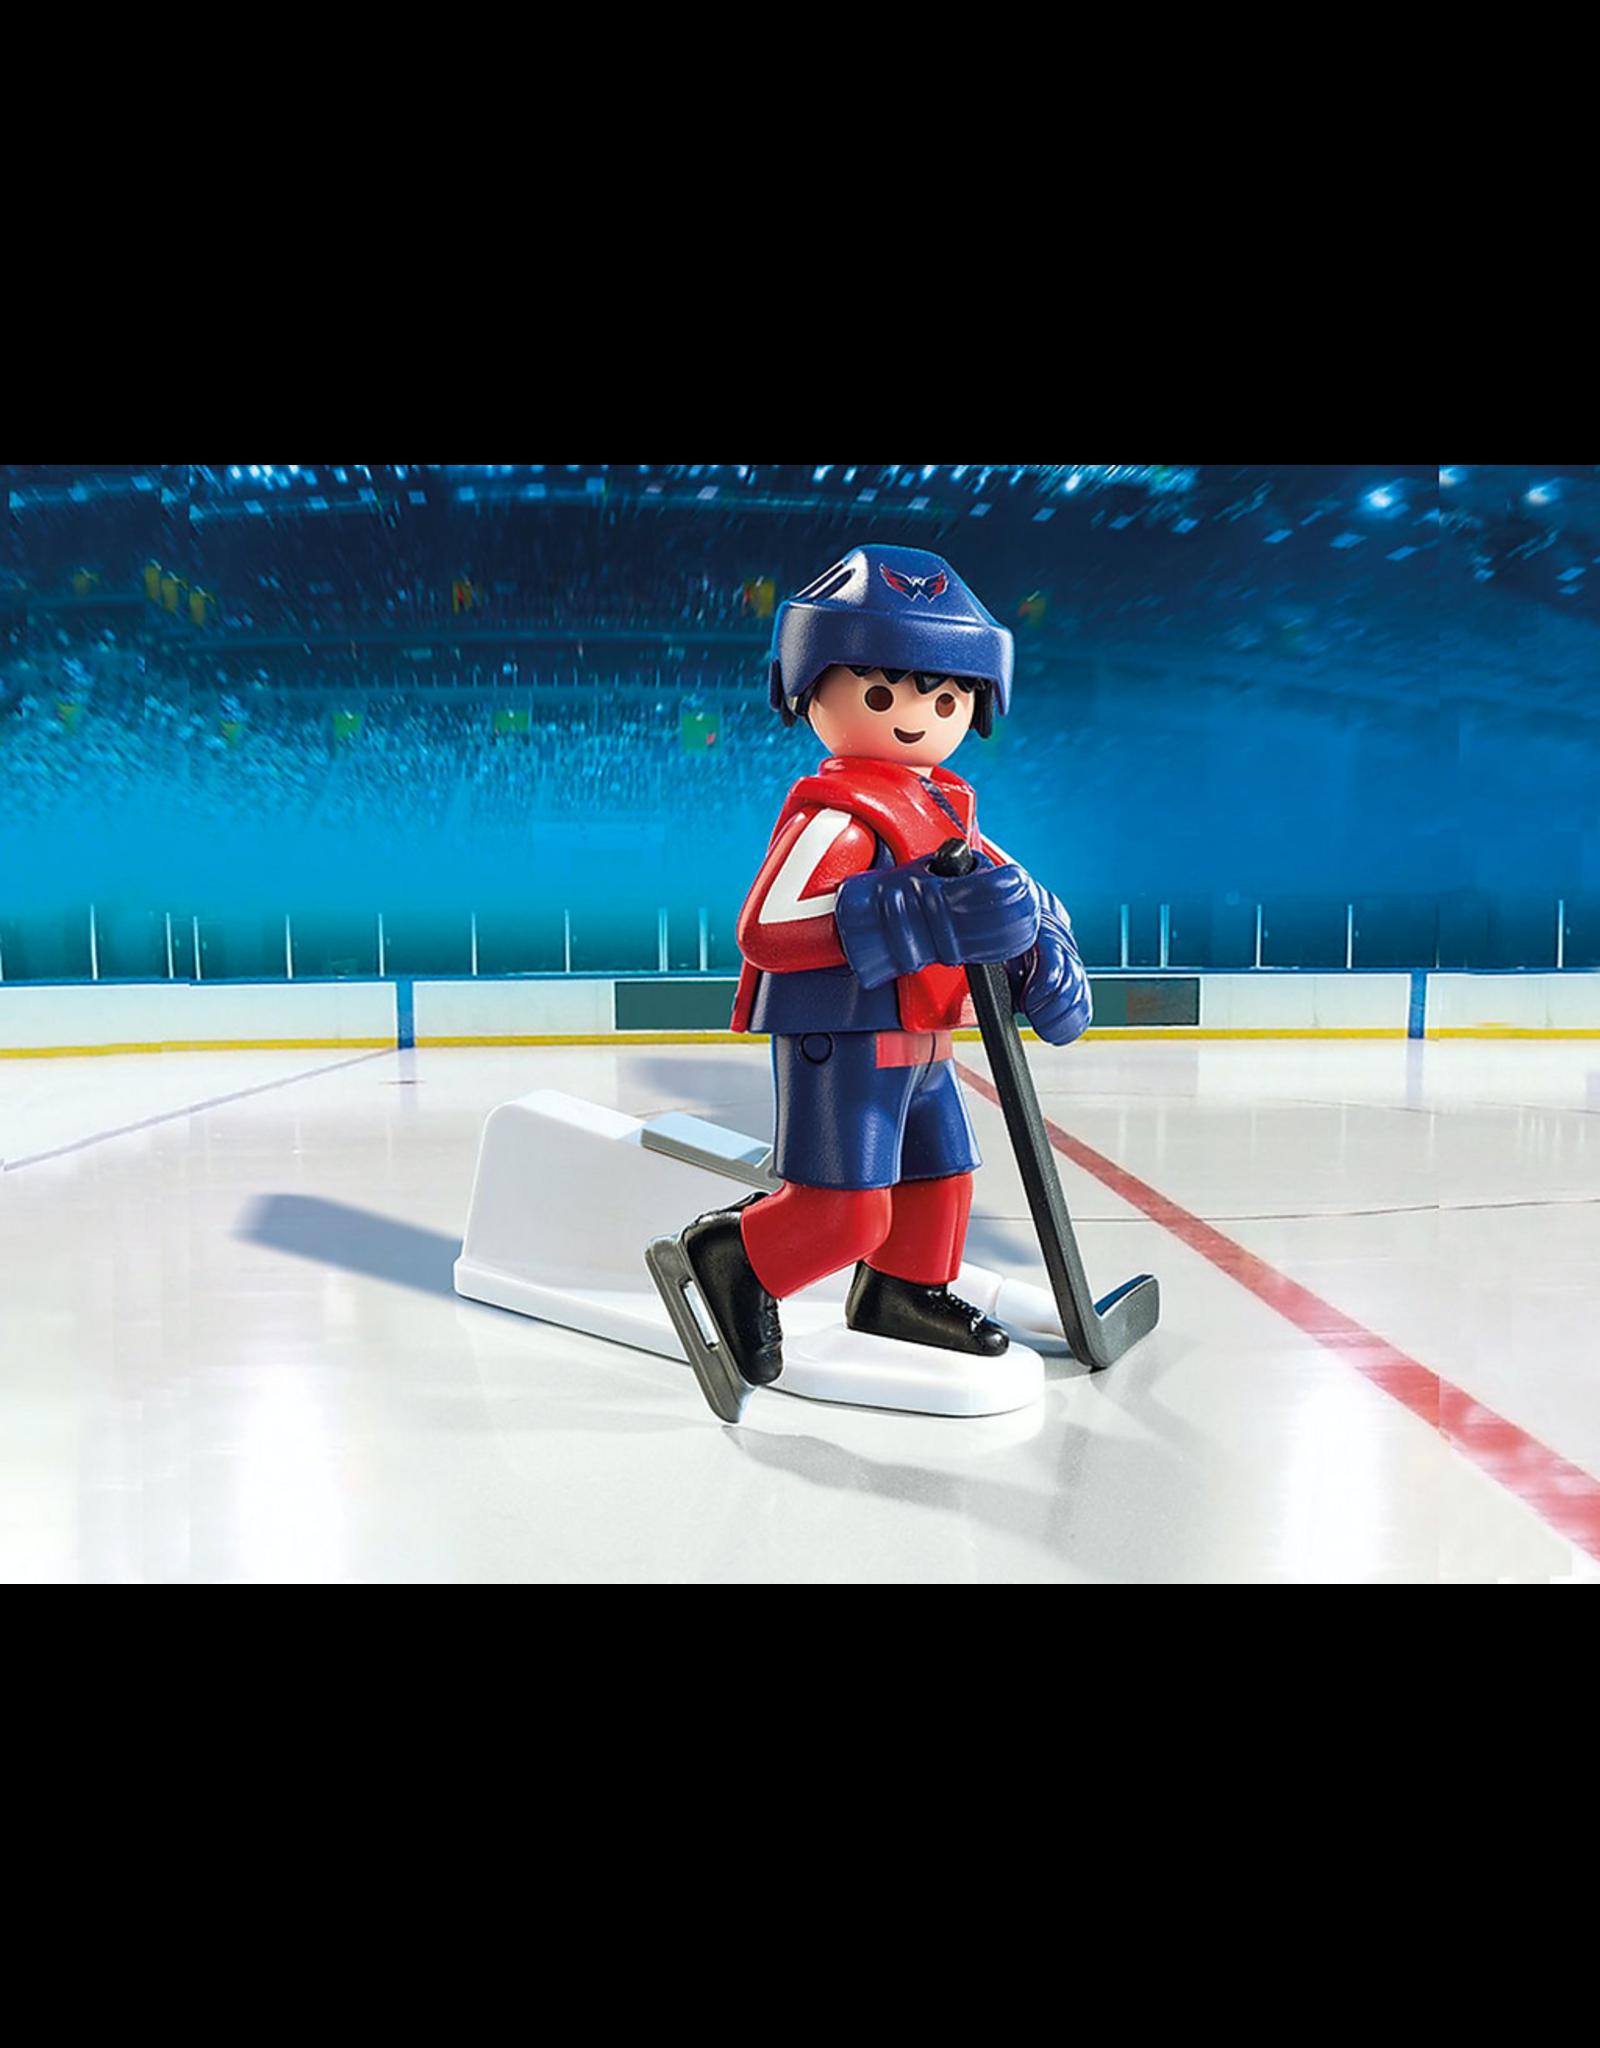 Playmobil NHL® WASHINGTON CAPITALS® PLAYER 9035